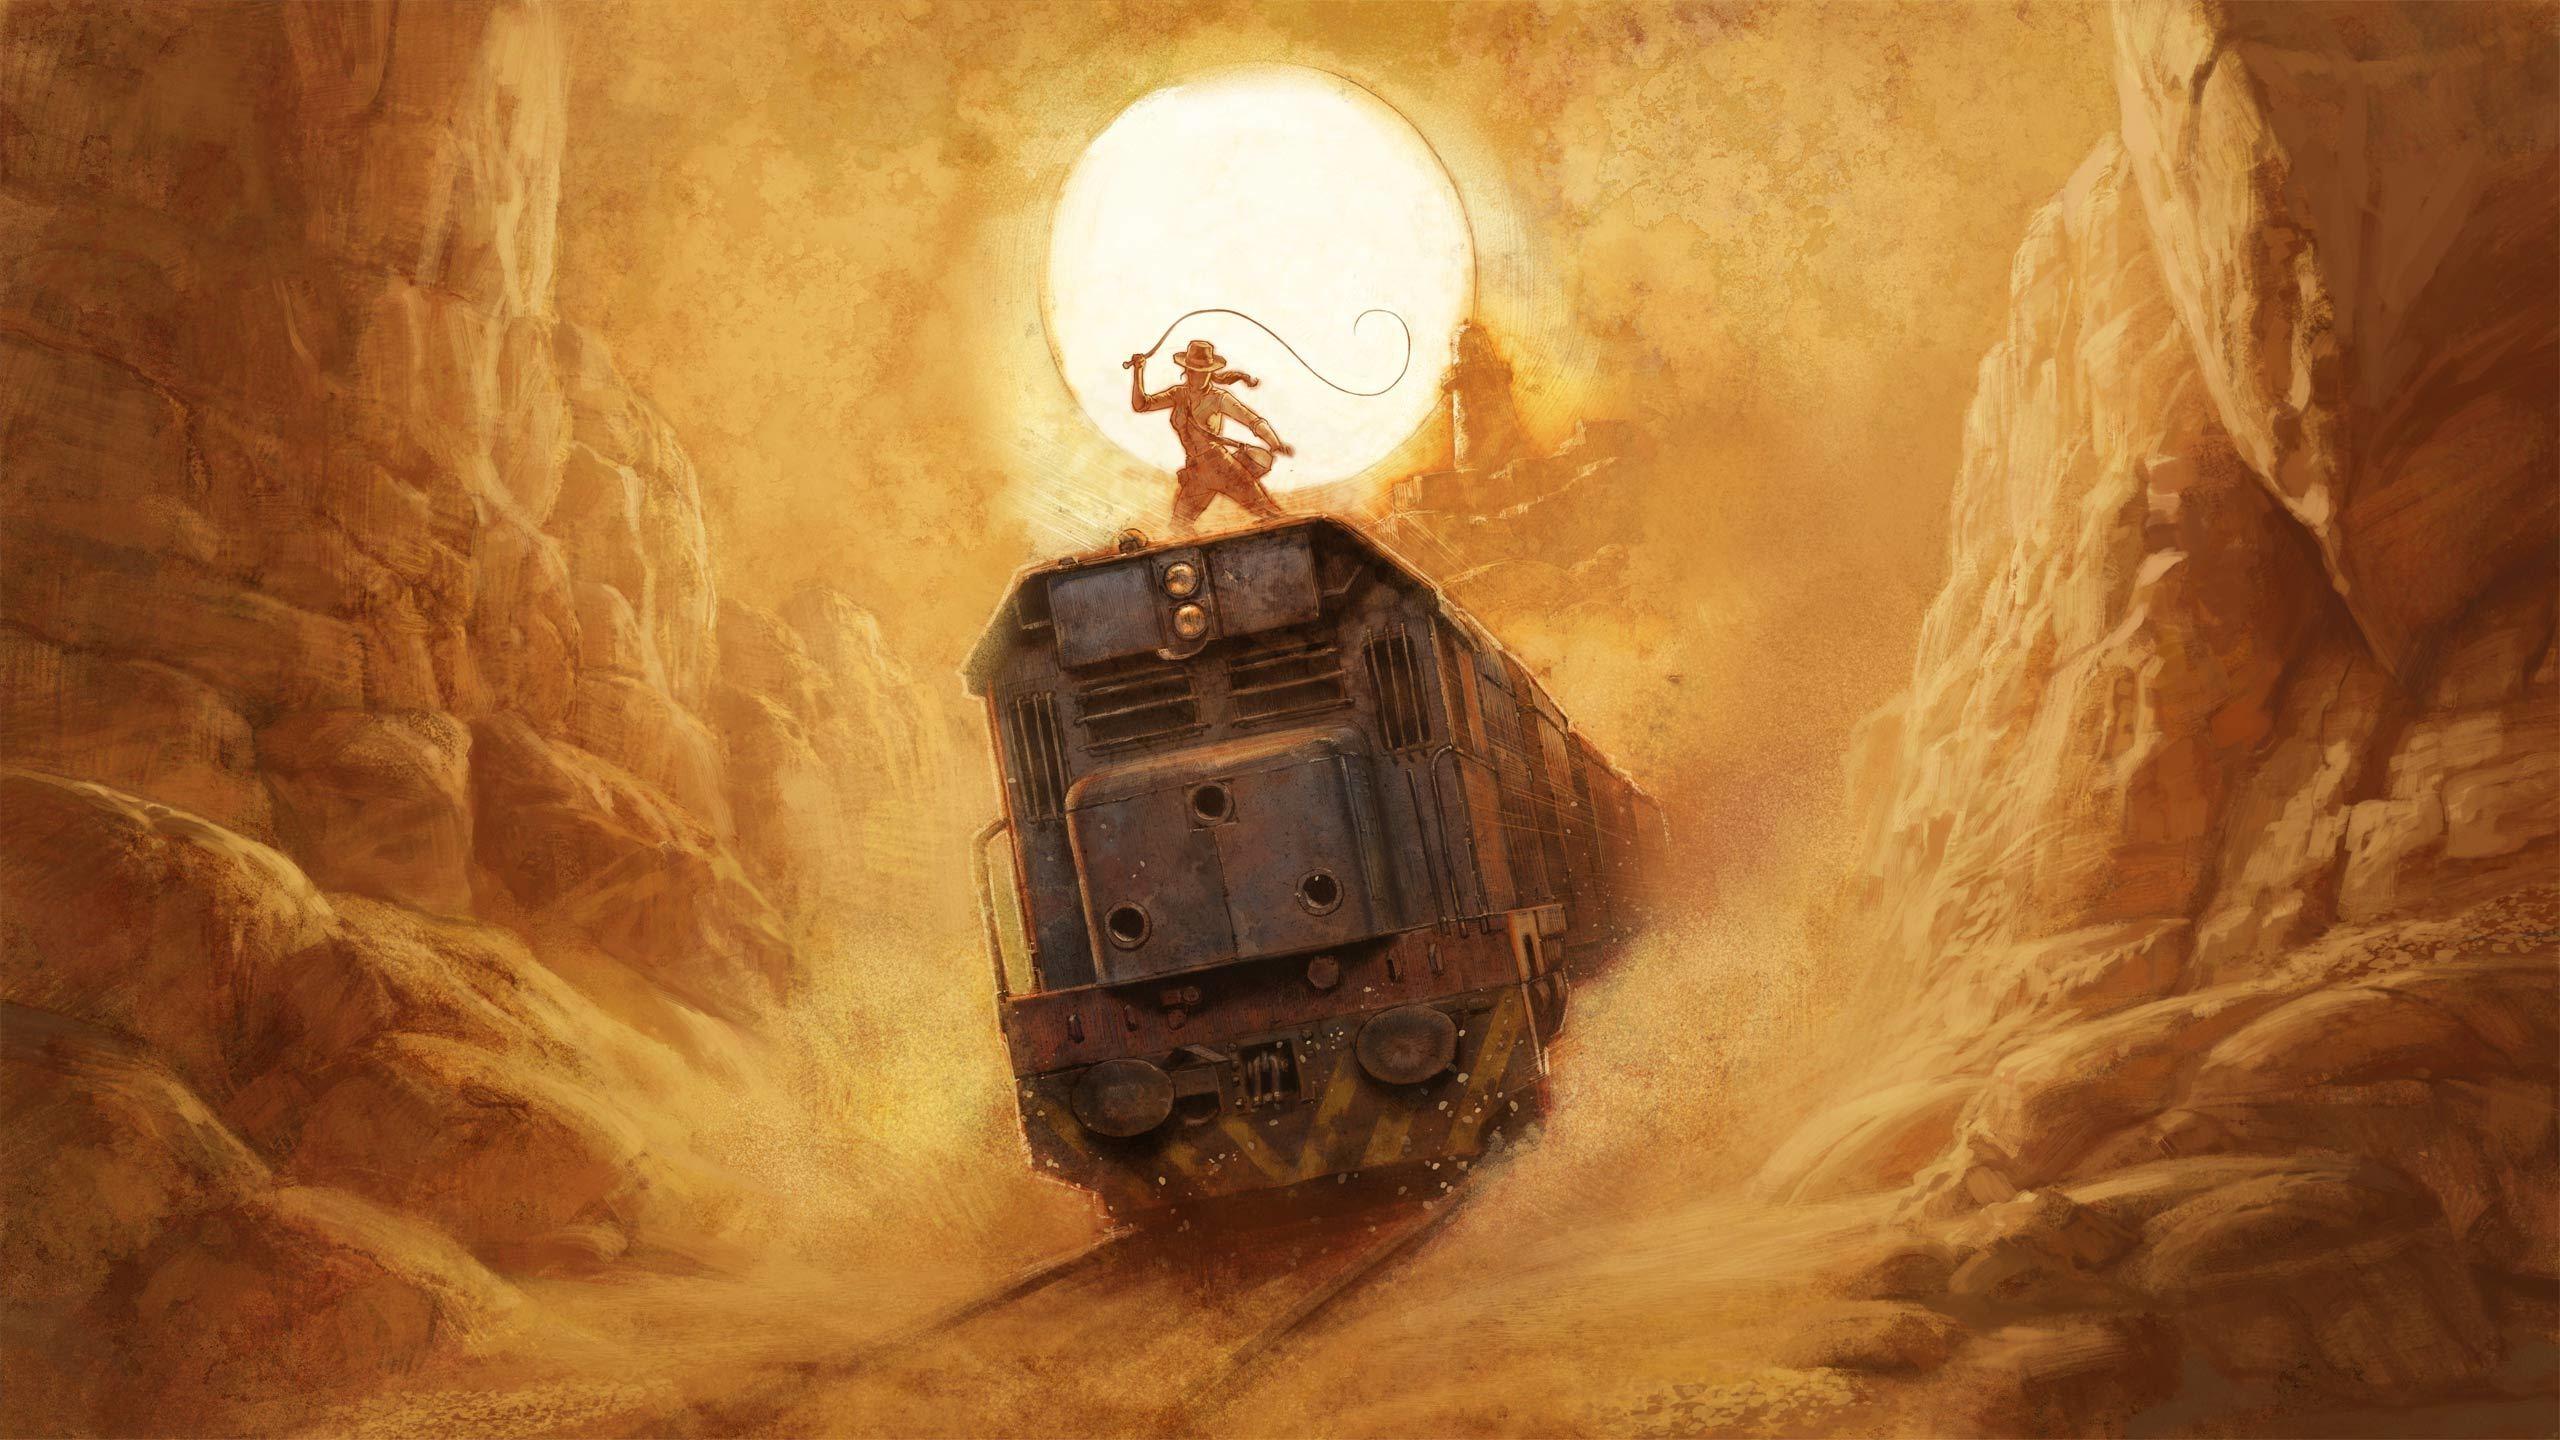 Download 2560x1440 Artwork Fantasy Art Train Moon Canyon Indiana Jones Wallpapers